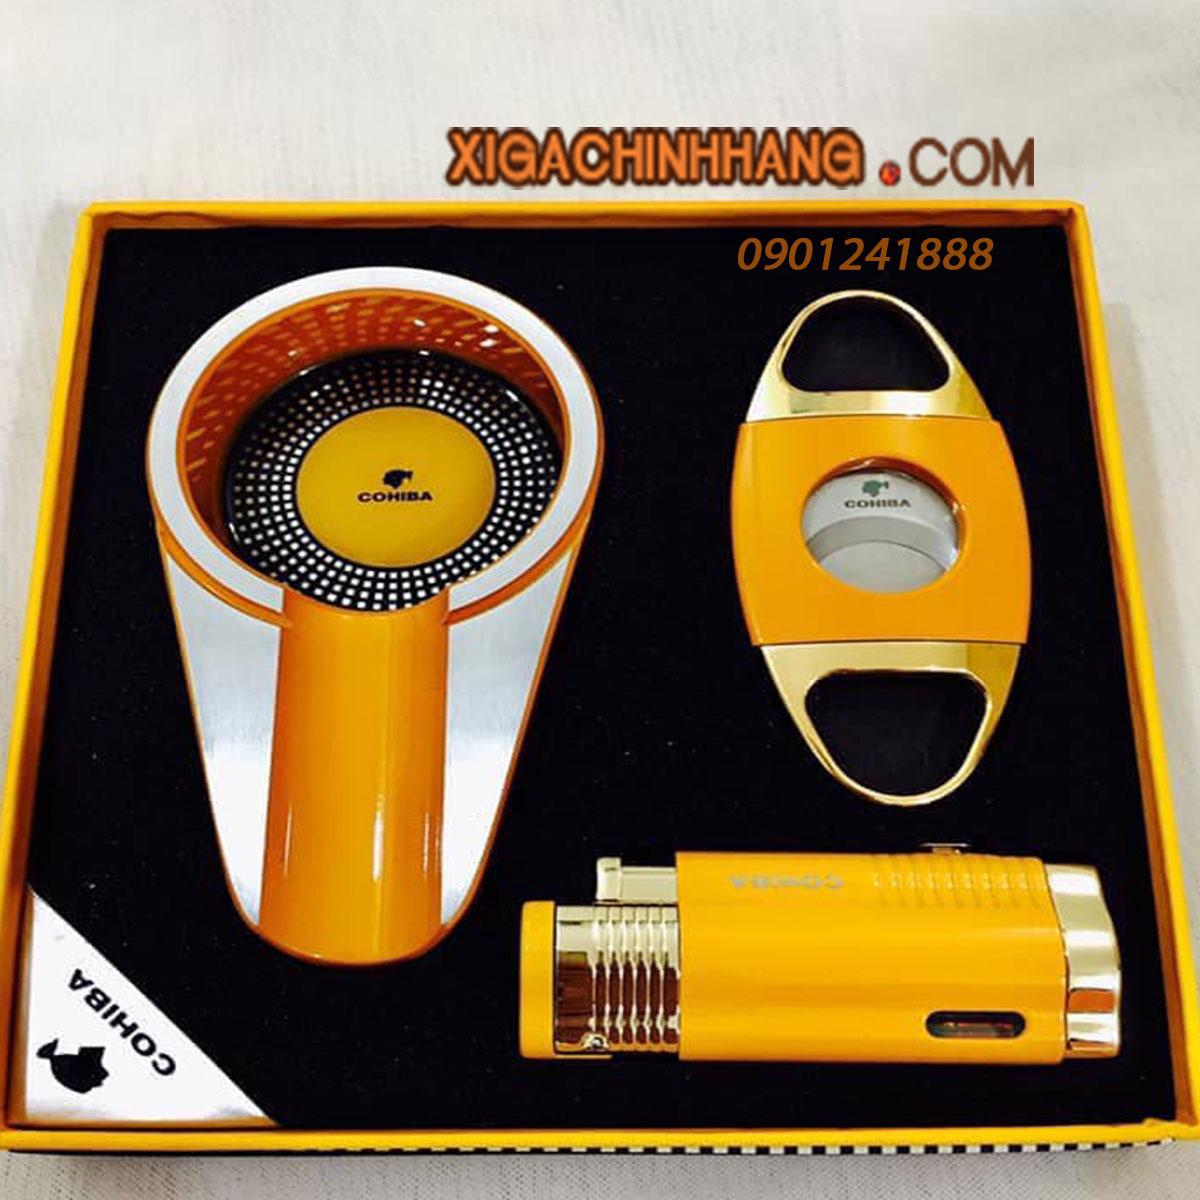 Set phụ kiện Cigar Cohiba TPHCM 0901241888 - 256 Pasteur Q3